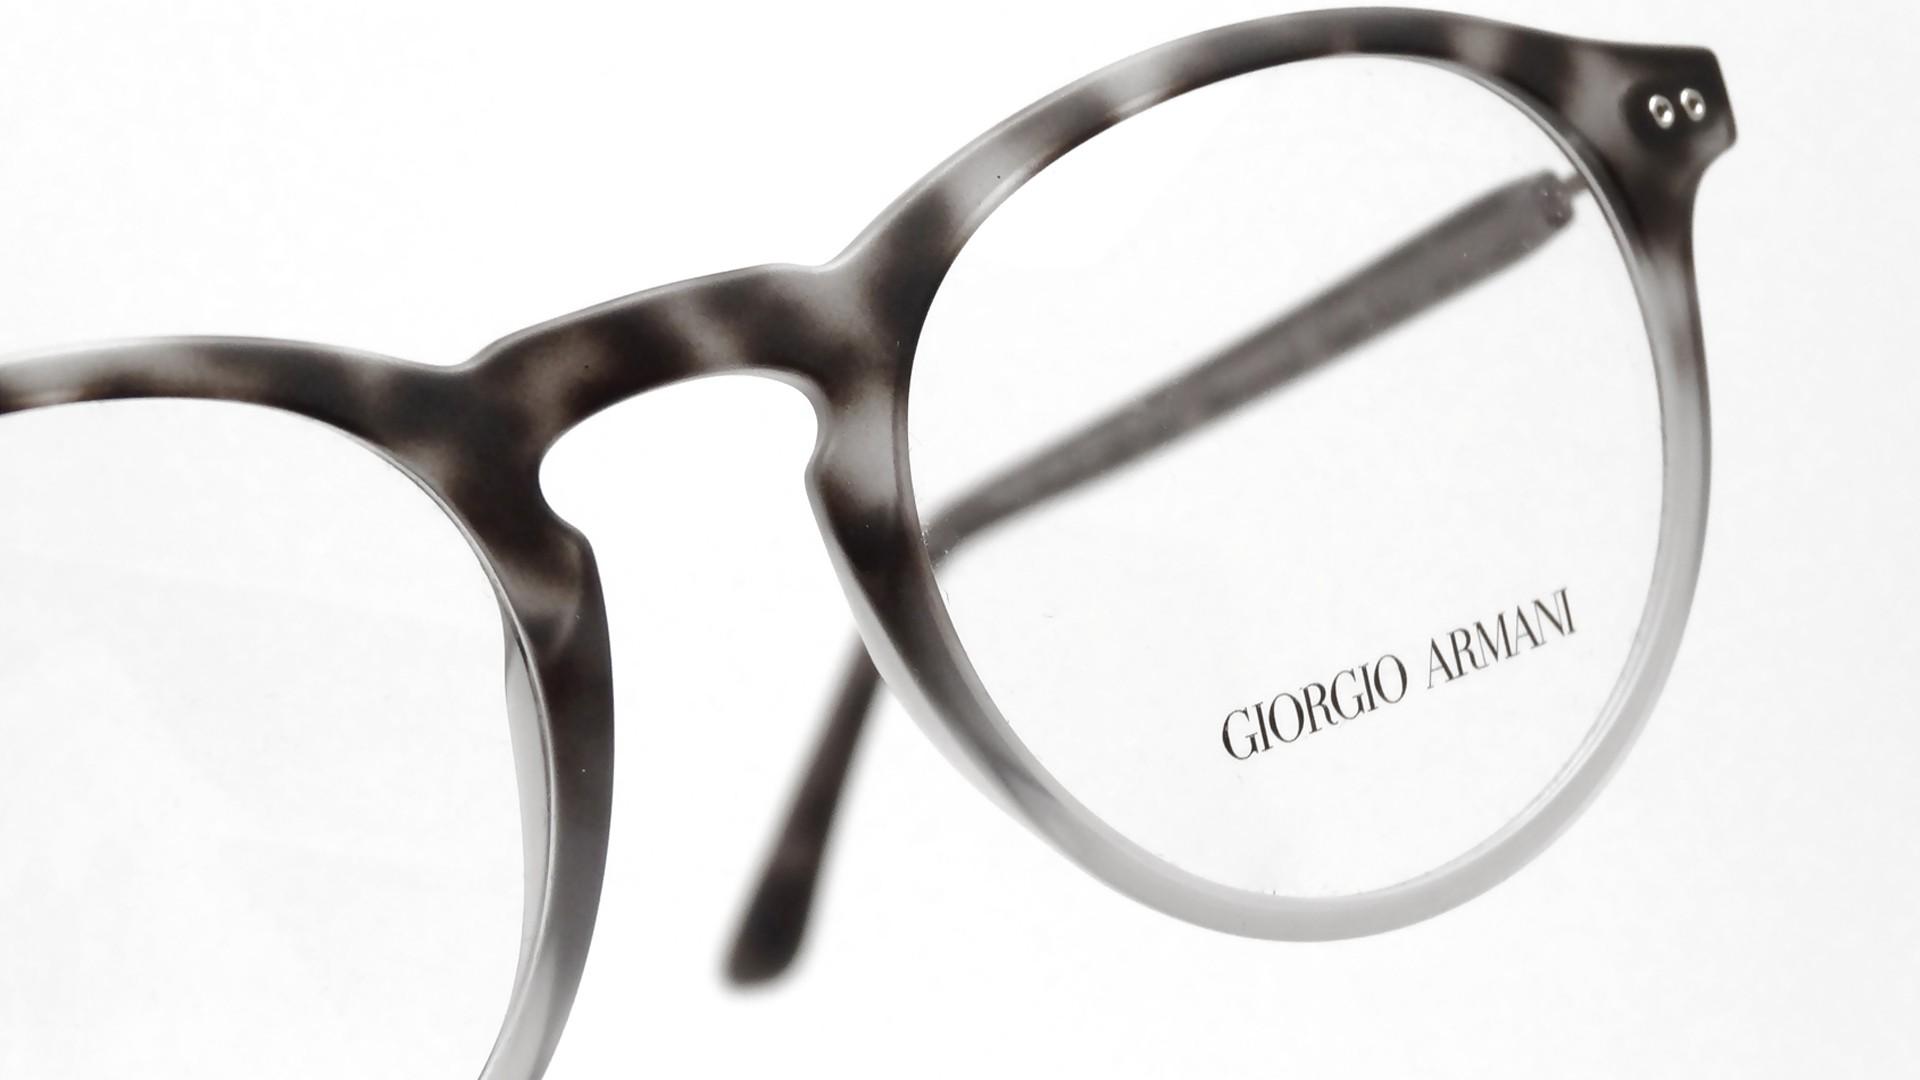 fc506f3a06 Giorgio Armani Frames Of Life Eyeglasses « Heritage Malta